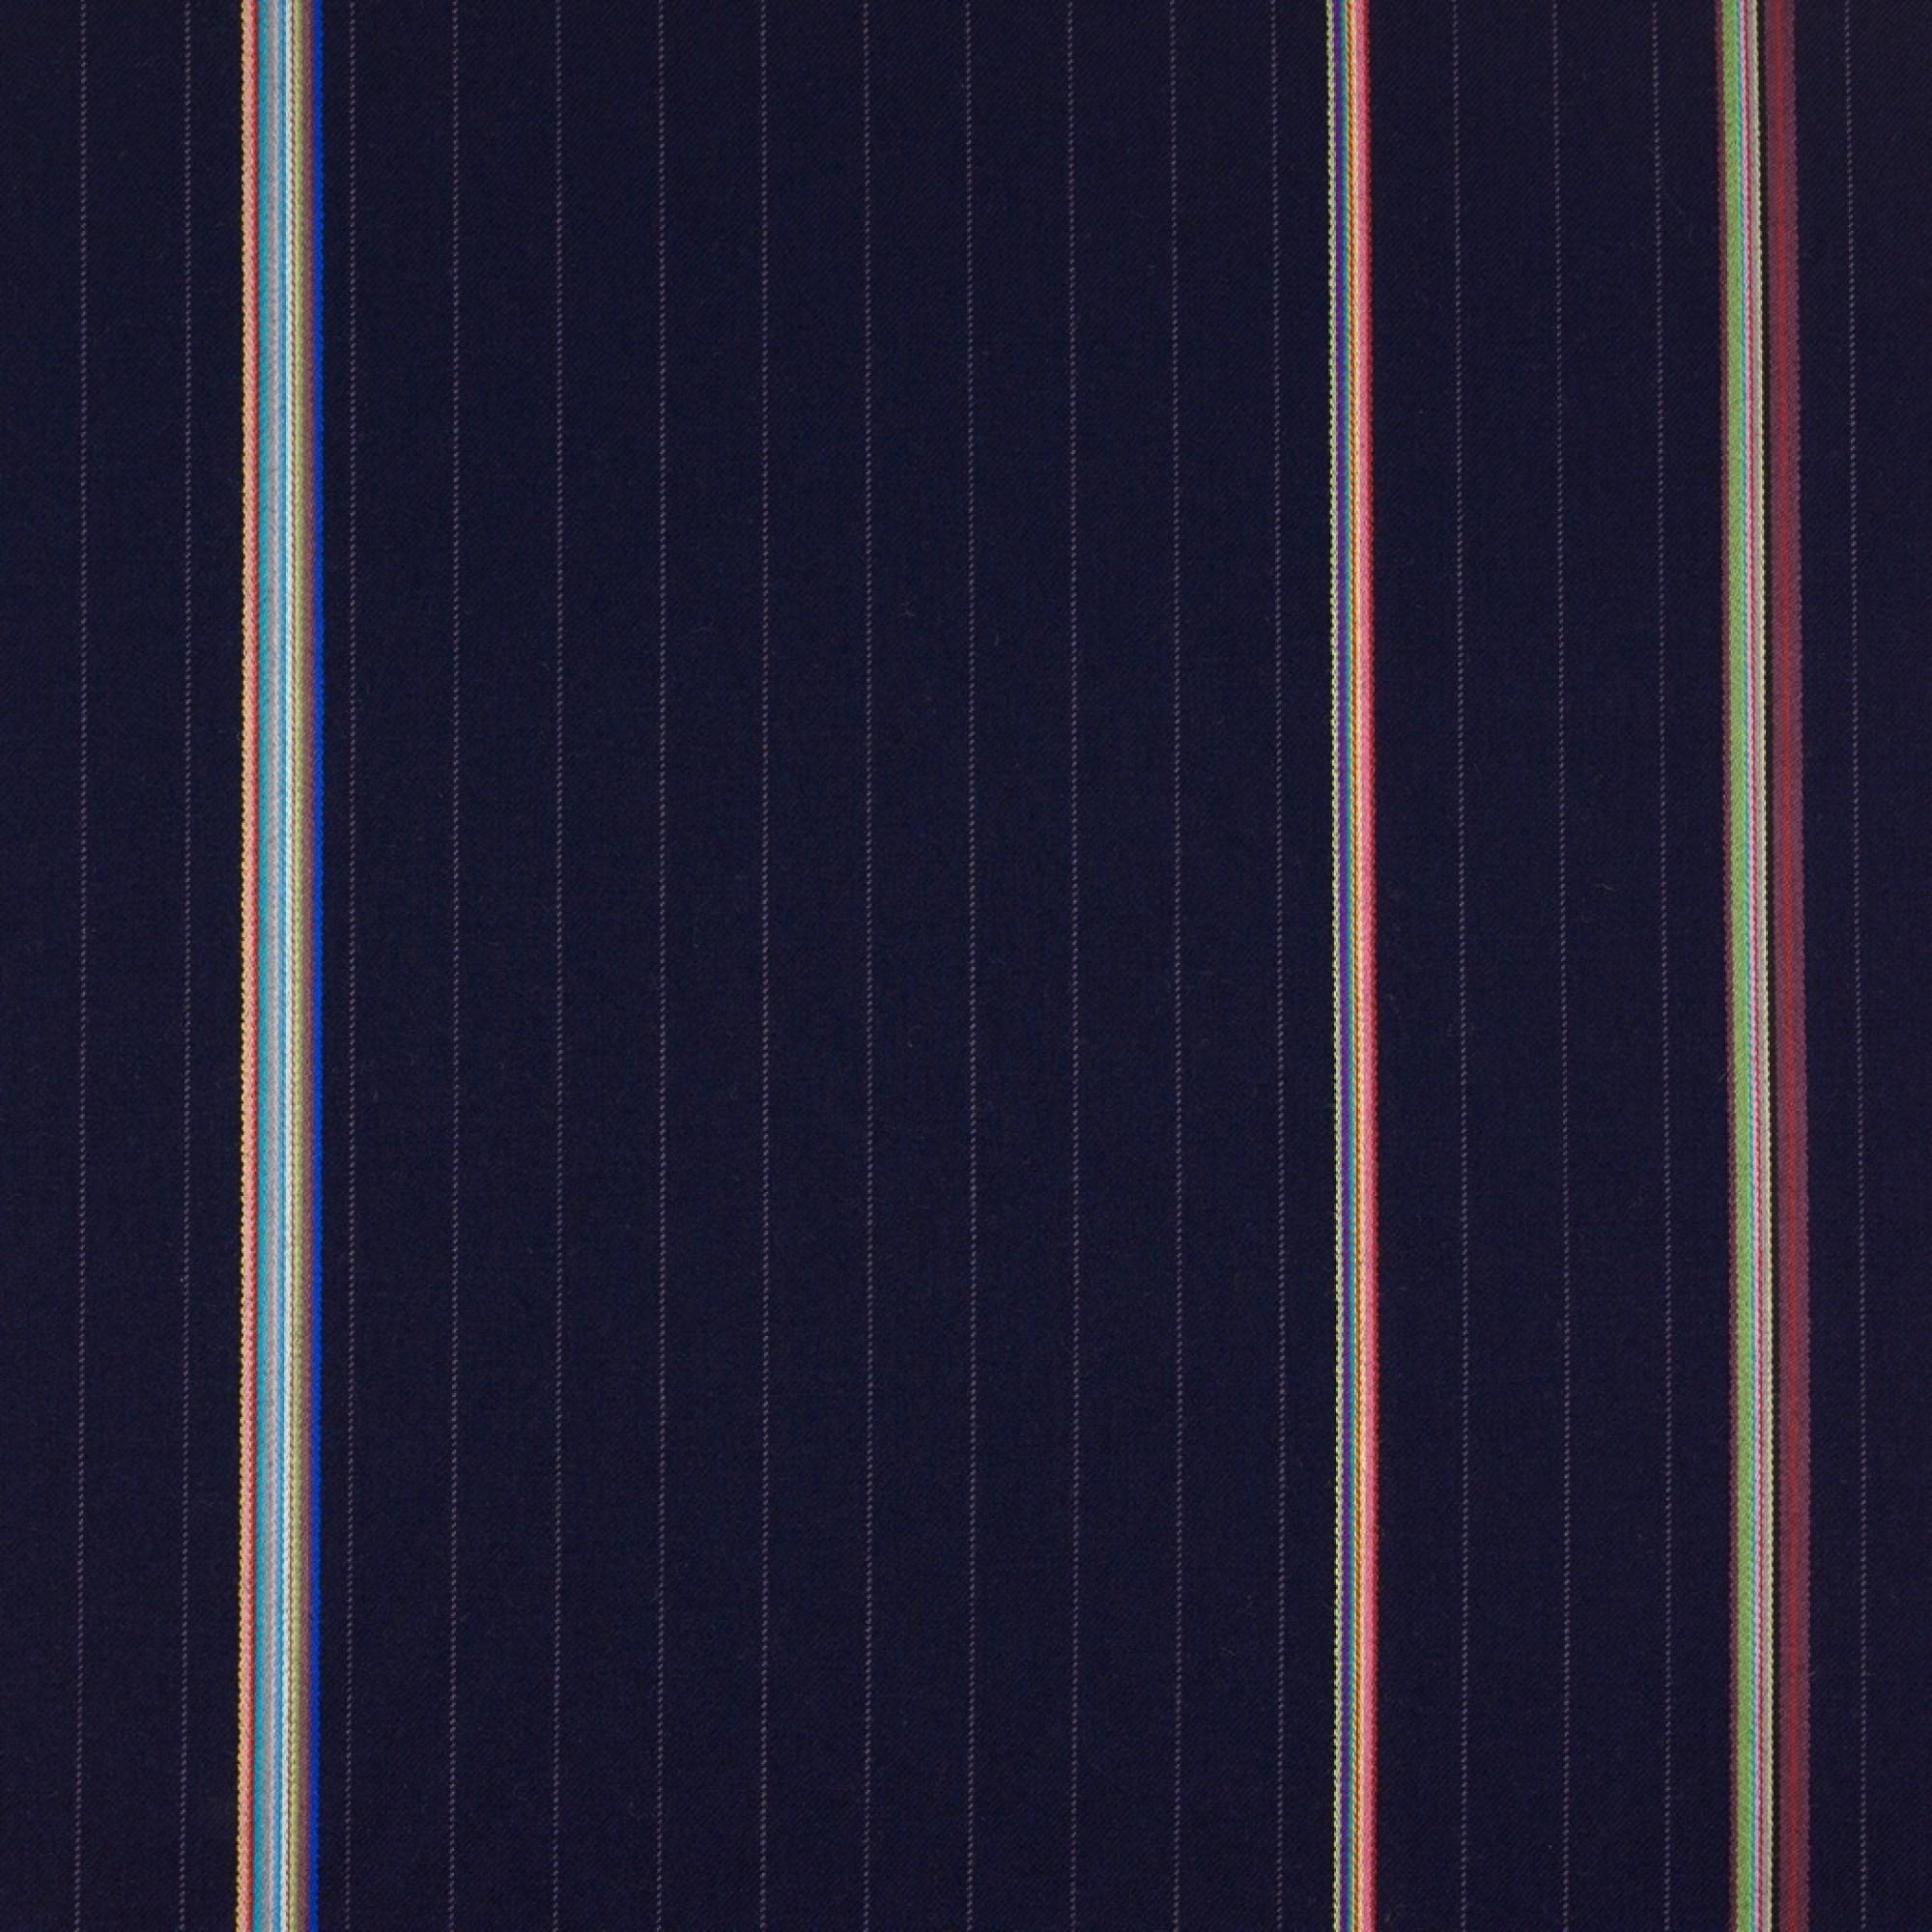 Exceptionnel Paul Smith Designer Fabric Stockist - London Fabric Company UK FR76